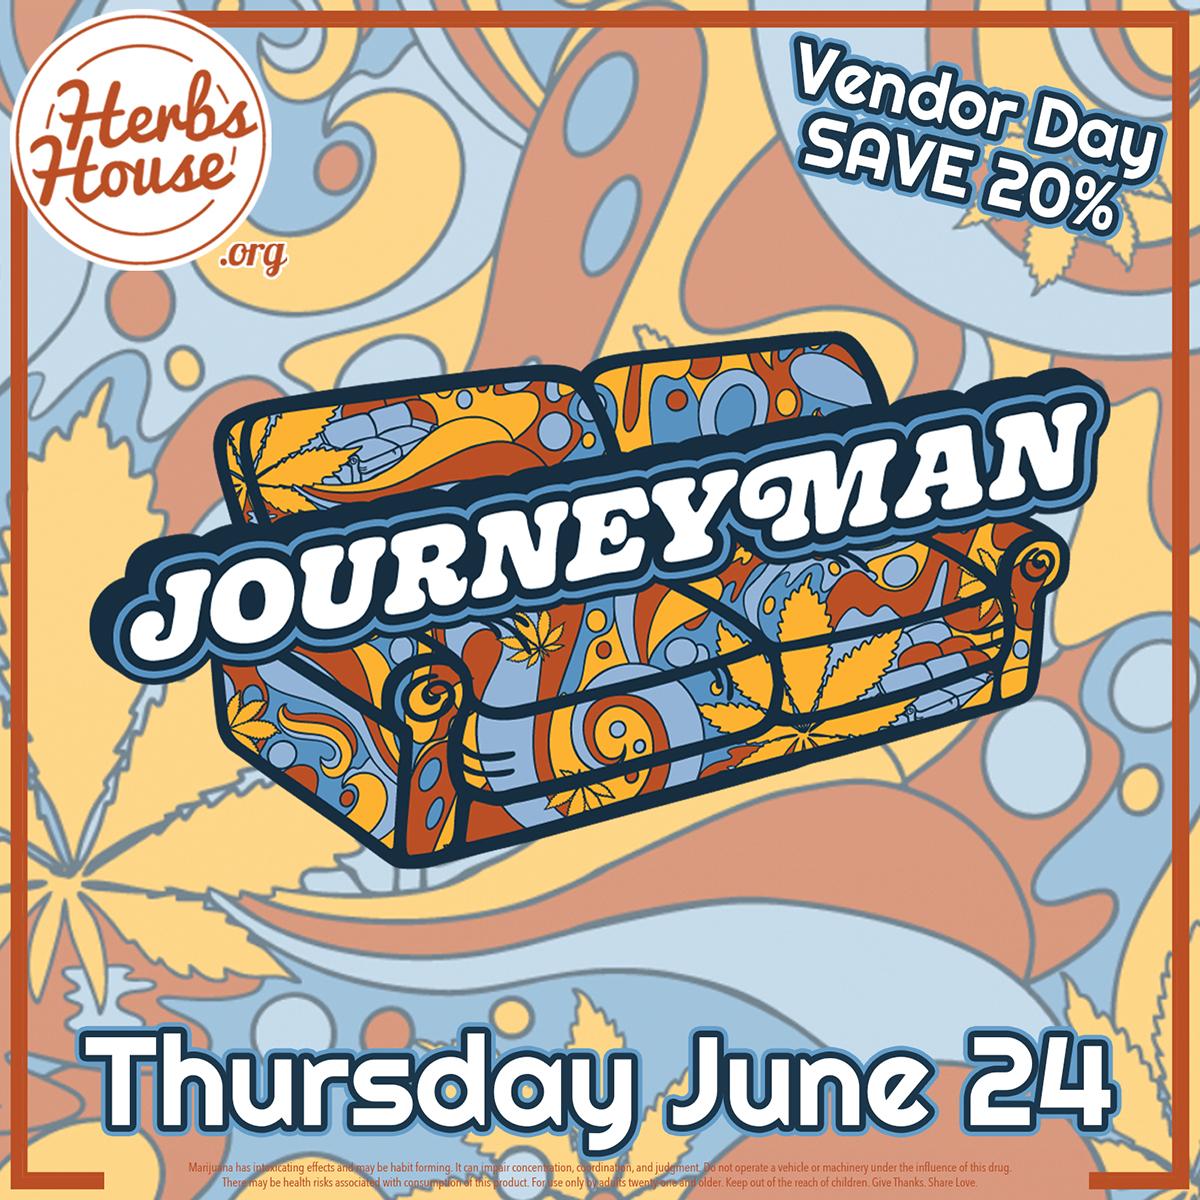 Journeyman Vendor Day Herbs House SAVE 20% June 24